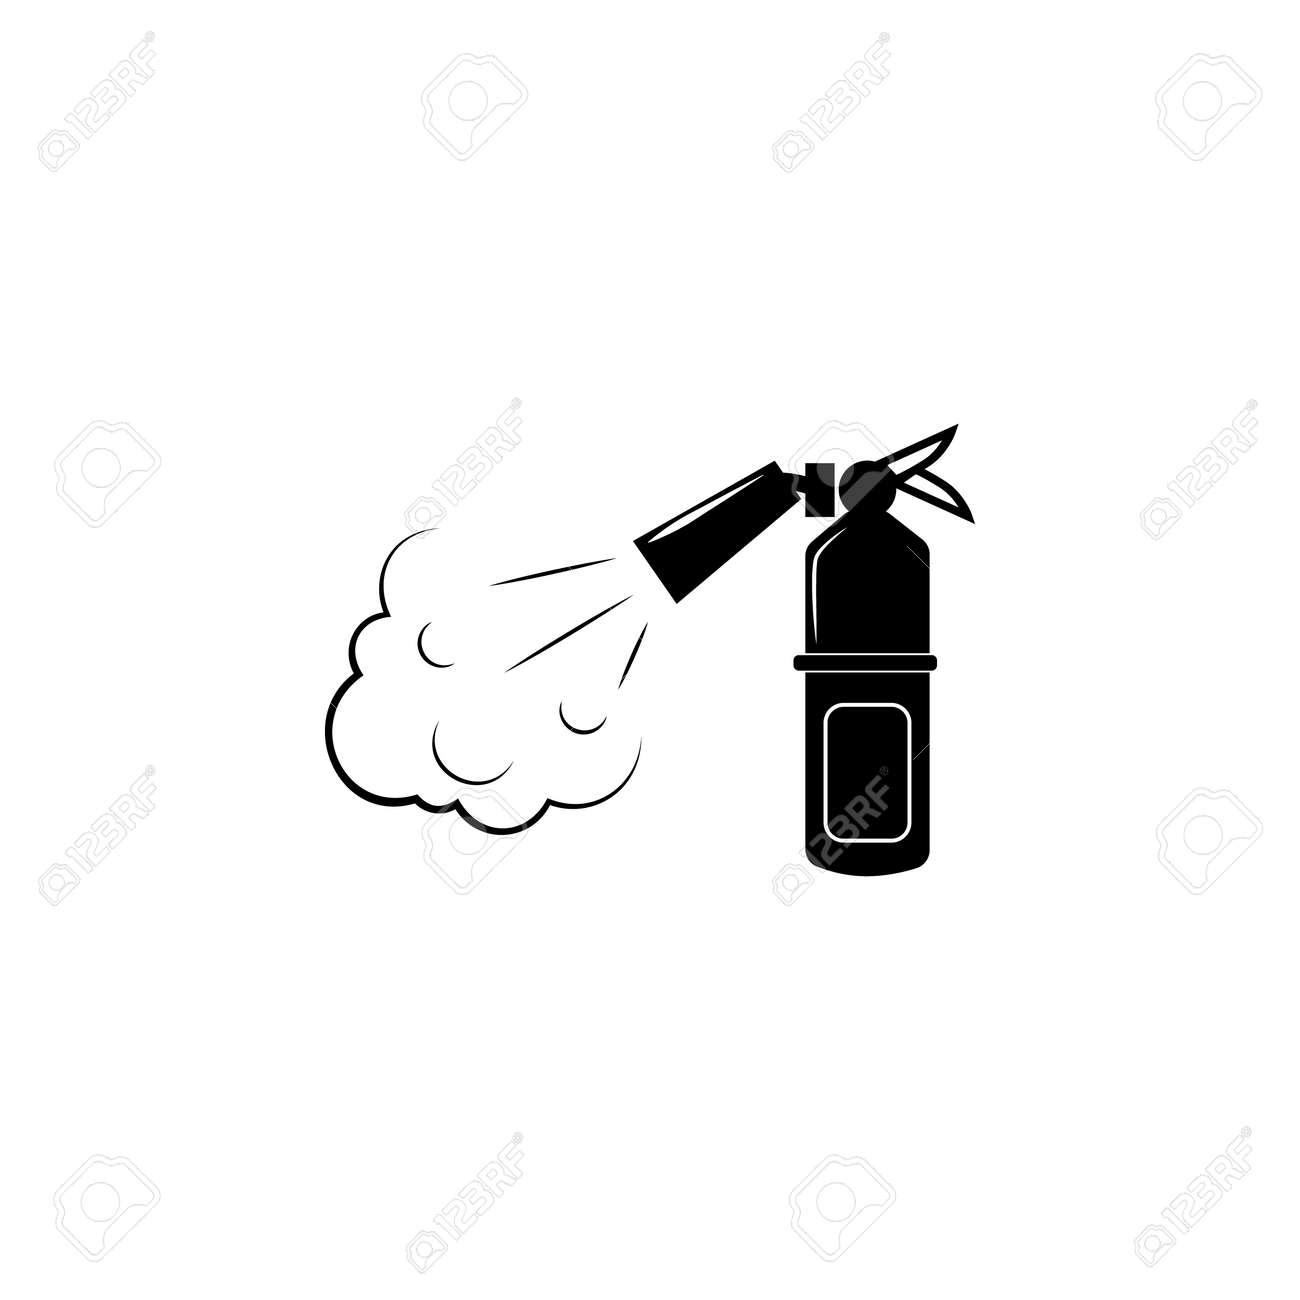 Fire extinguisher icon  Fireman element icon  Premium quality